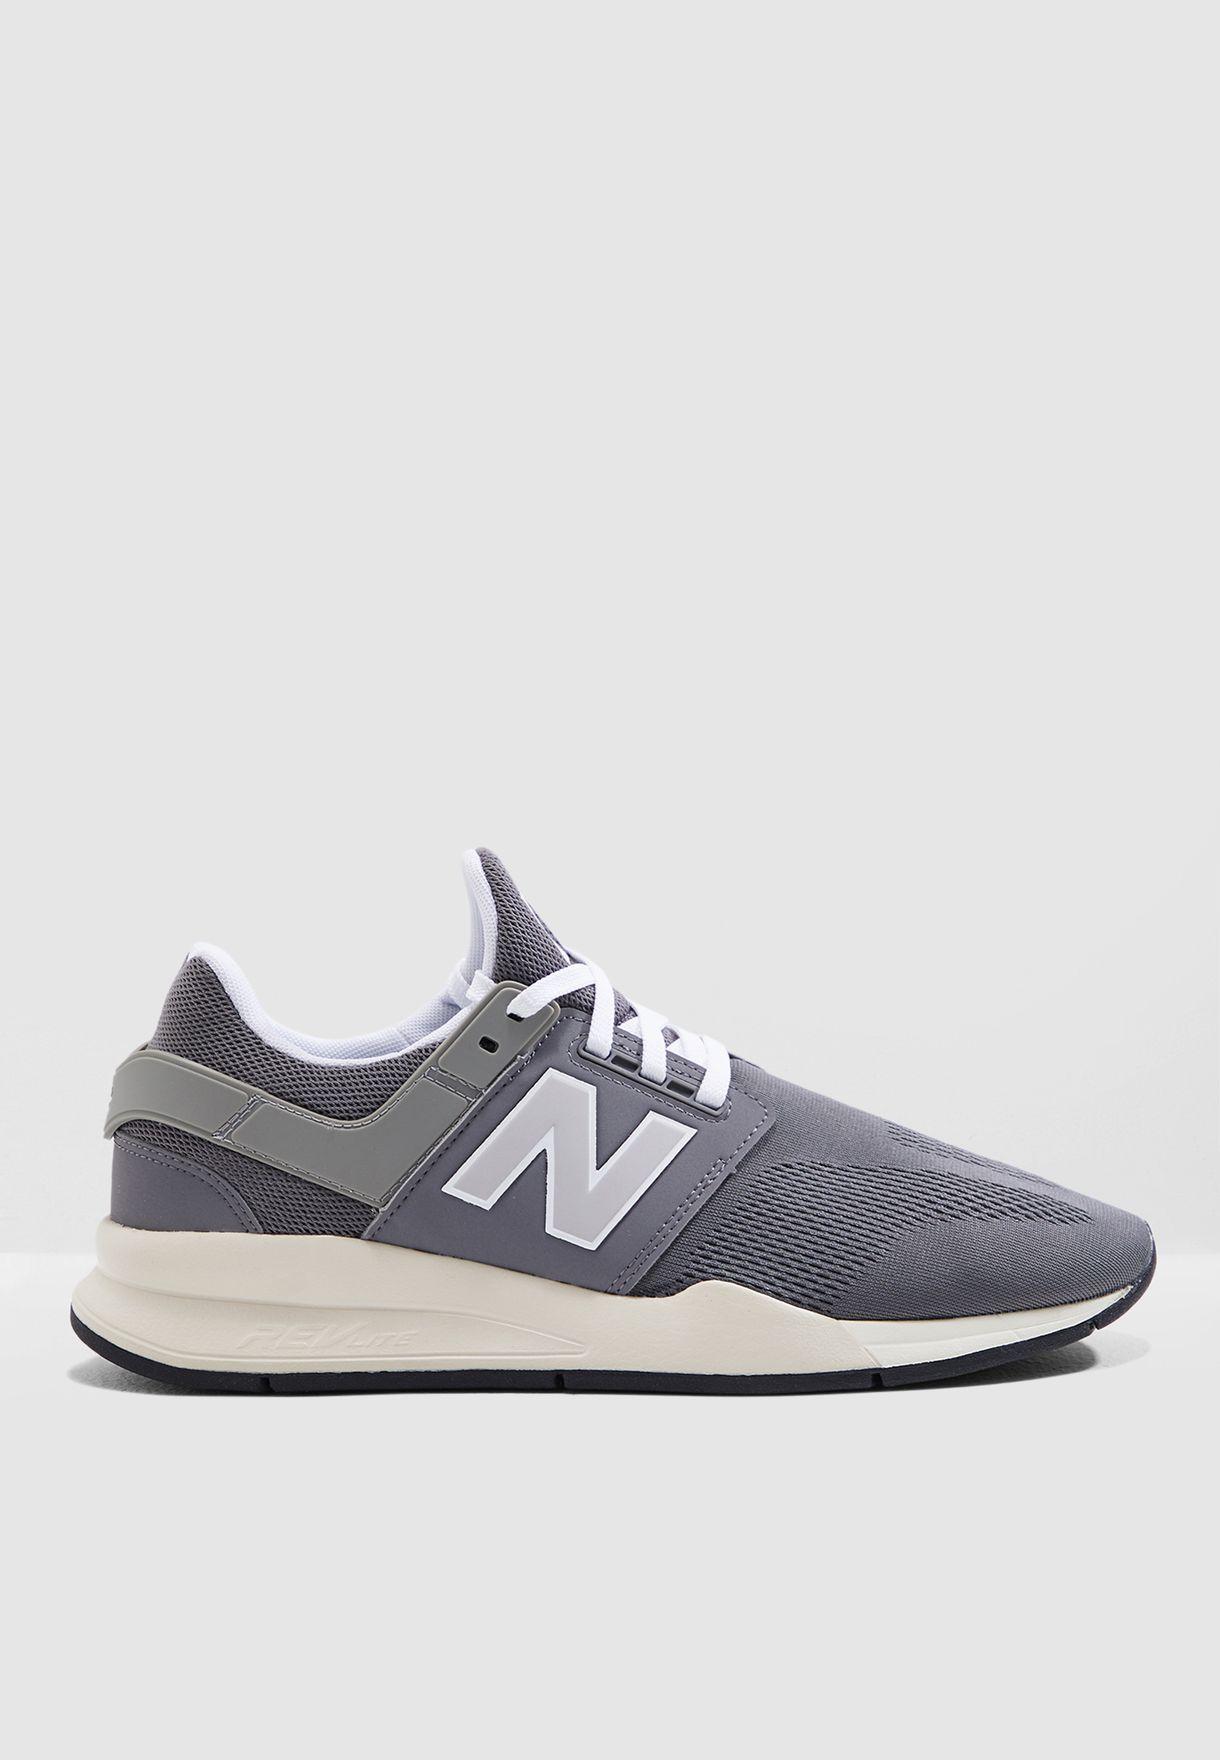 e506331a6 تسوق حذاء 247 ماركة نيو بالانس لون رمادي MS247MM في السعودية ...